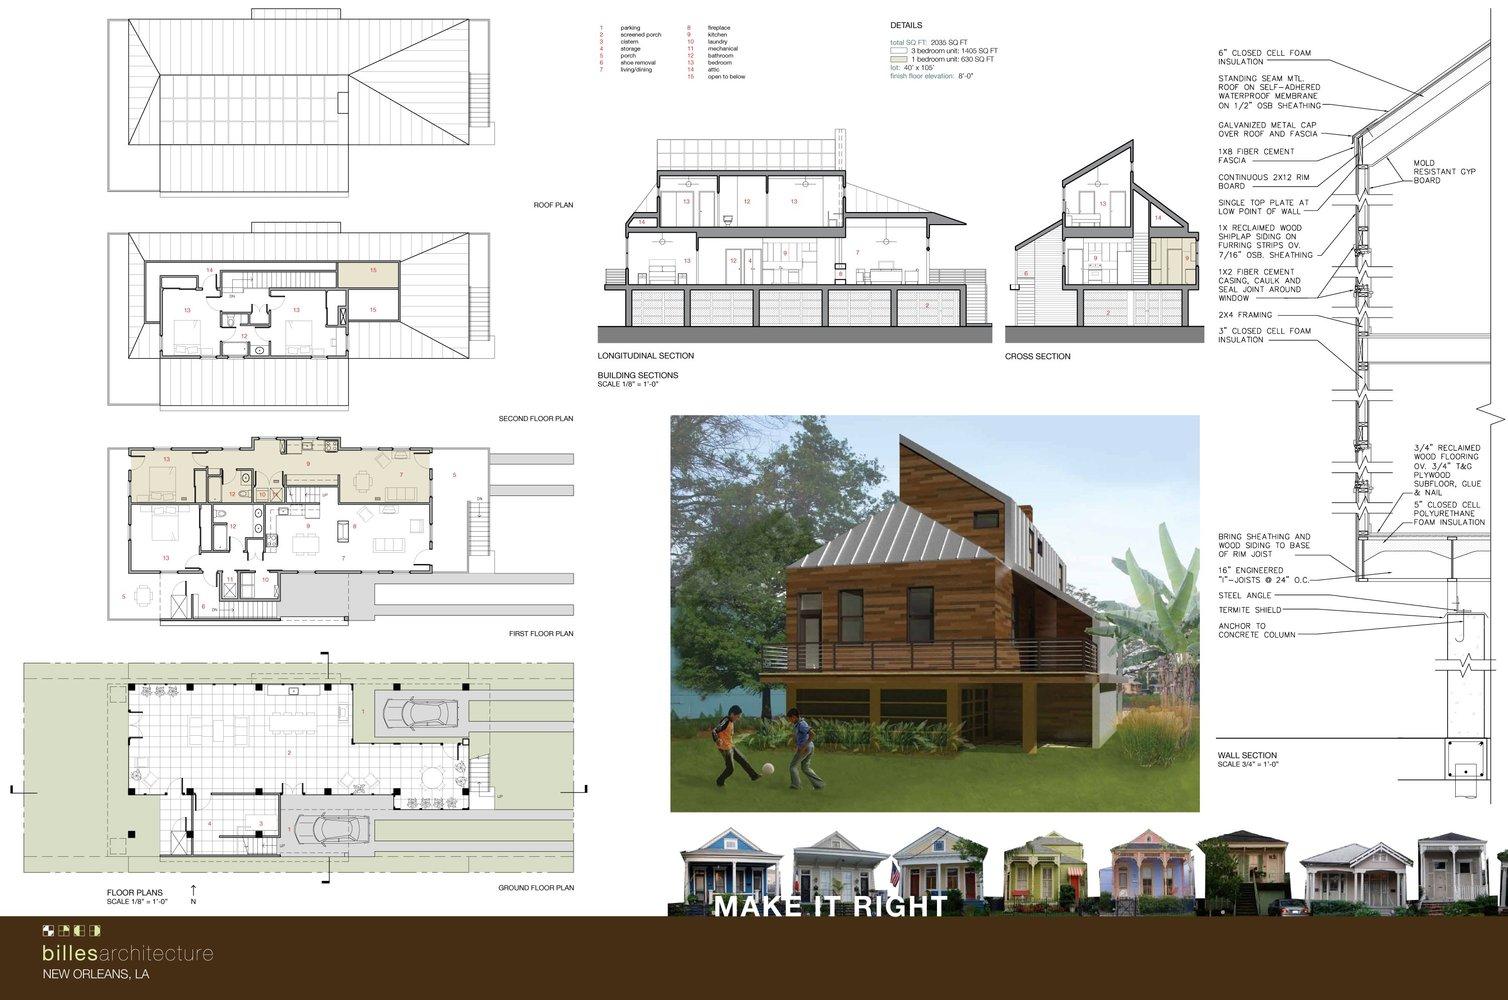 Gallery of Brad Pitt\'s Make It Right presents duplex homes for NOLA - 19